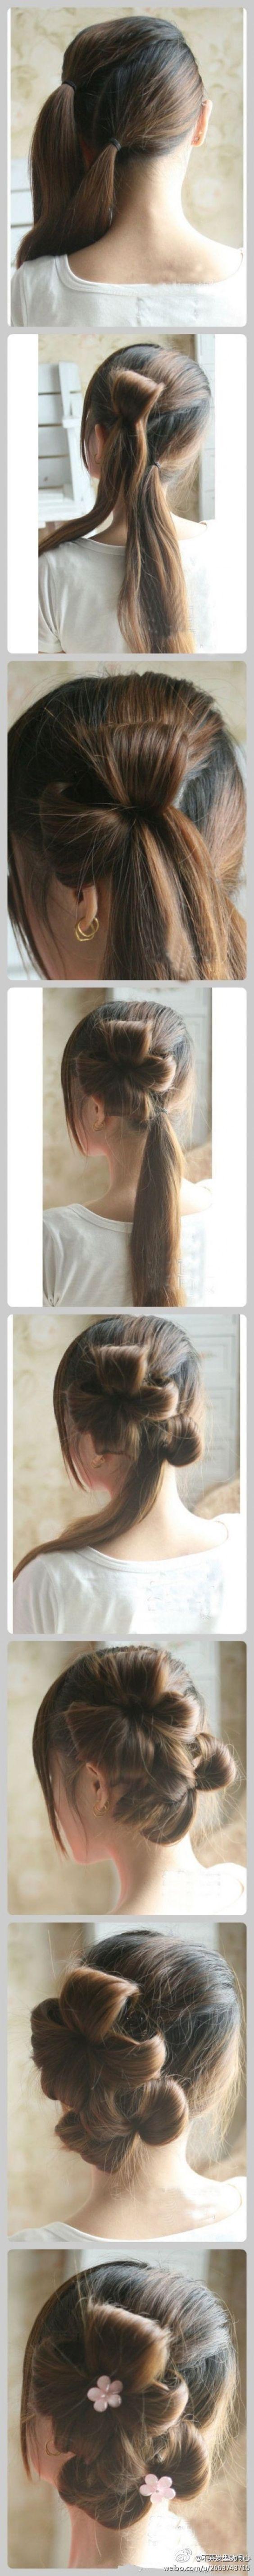 Hair #1123744 | Weddbook